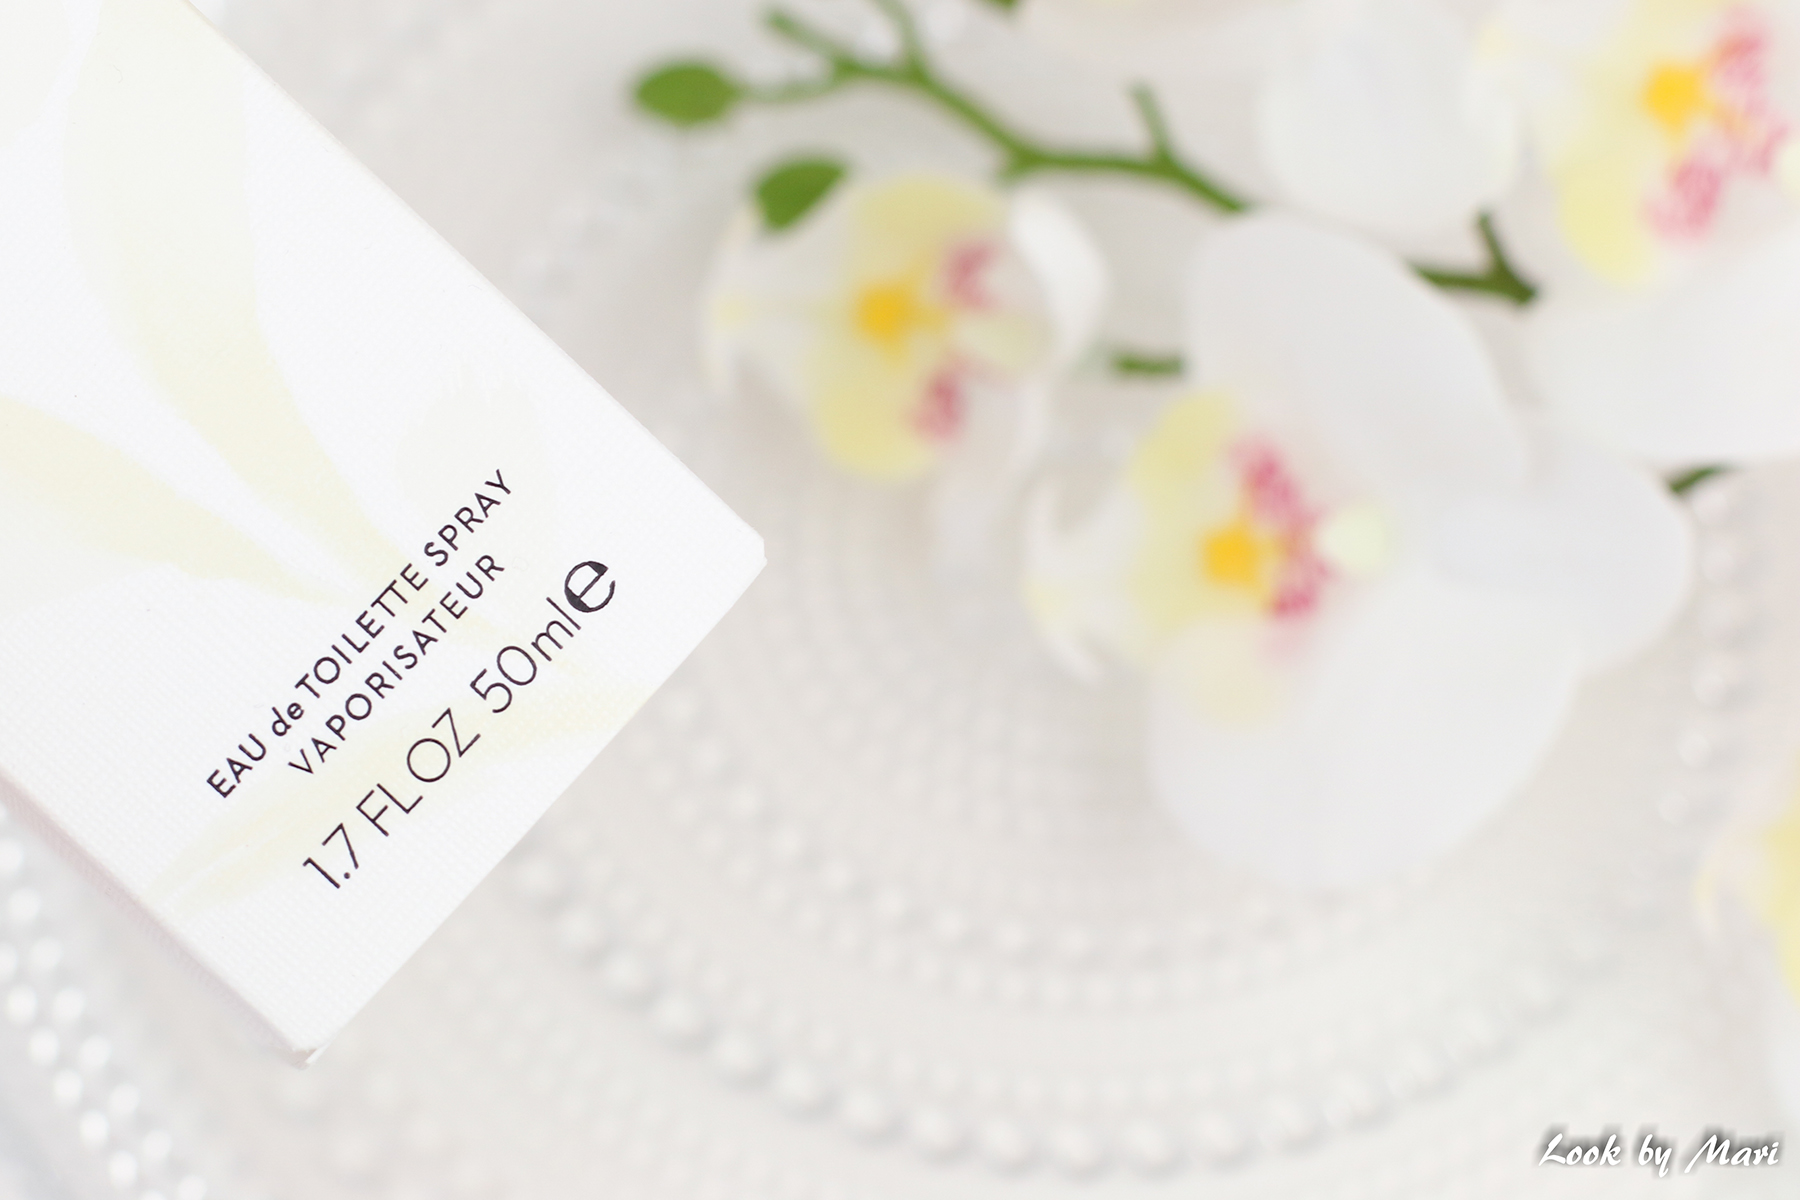 3 elizabeth arden white tea hajuvesi kokemuksia tuoksu makea hinta suomesta eleven.fi stockmann blogi